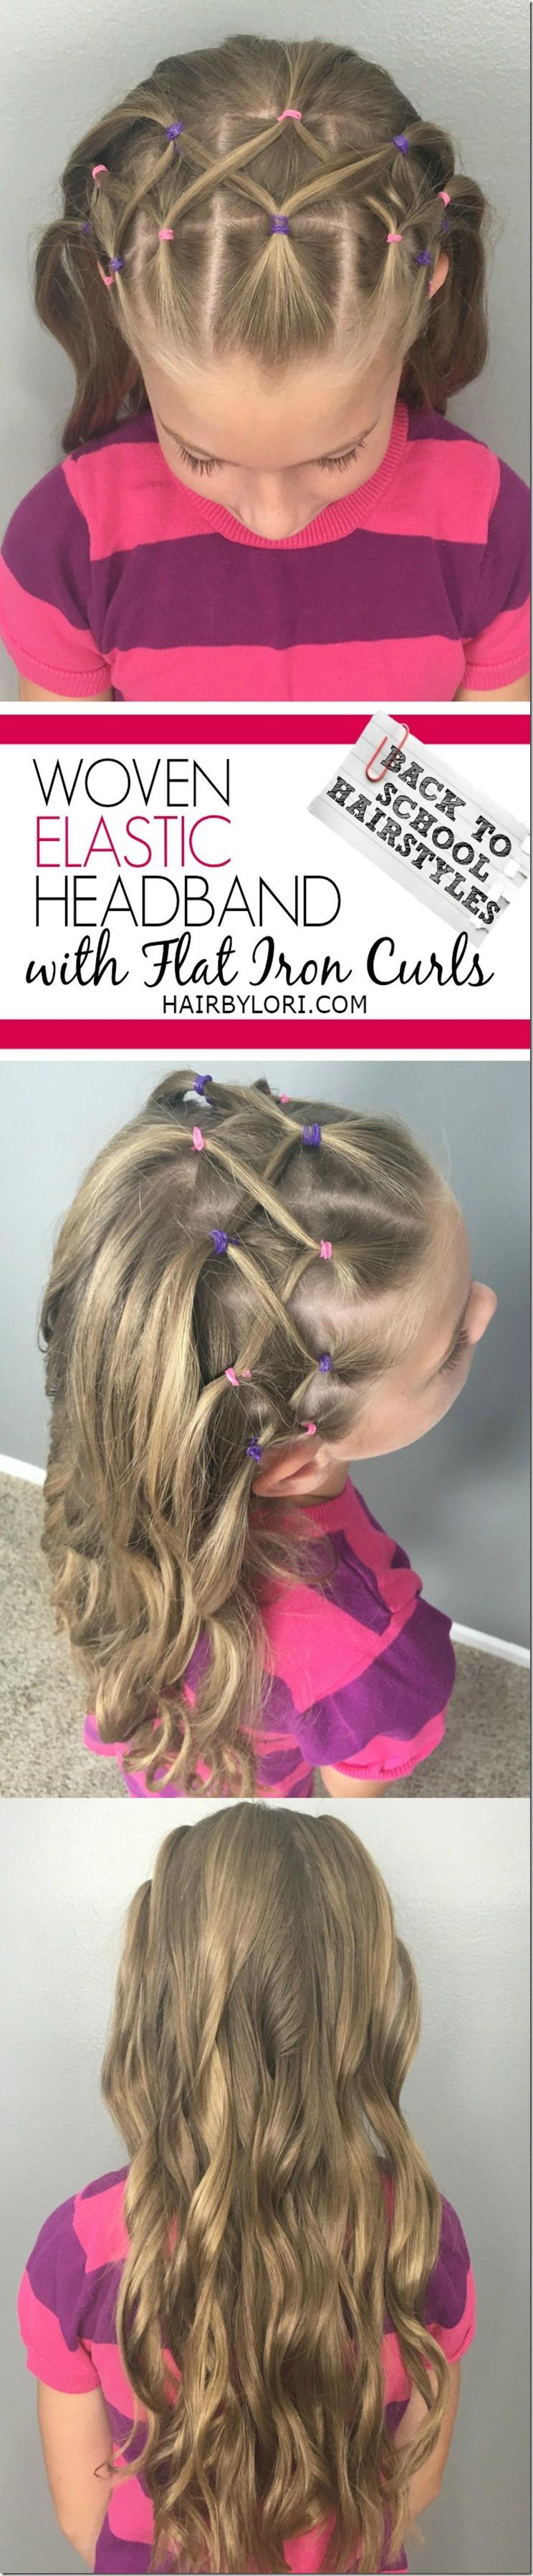 Woven elastic headband with flat iron curls flat iron curls